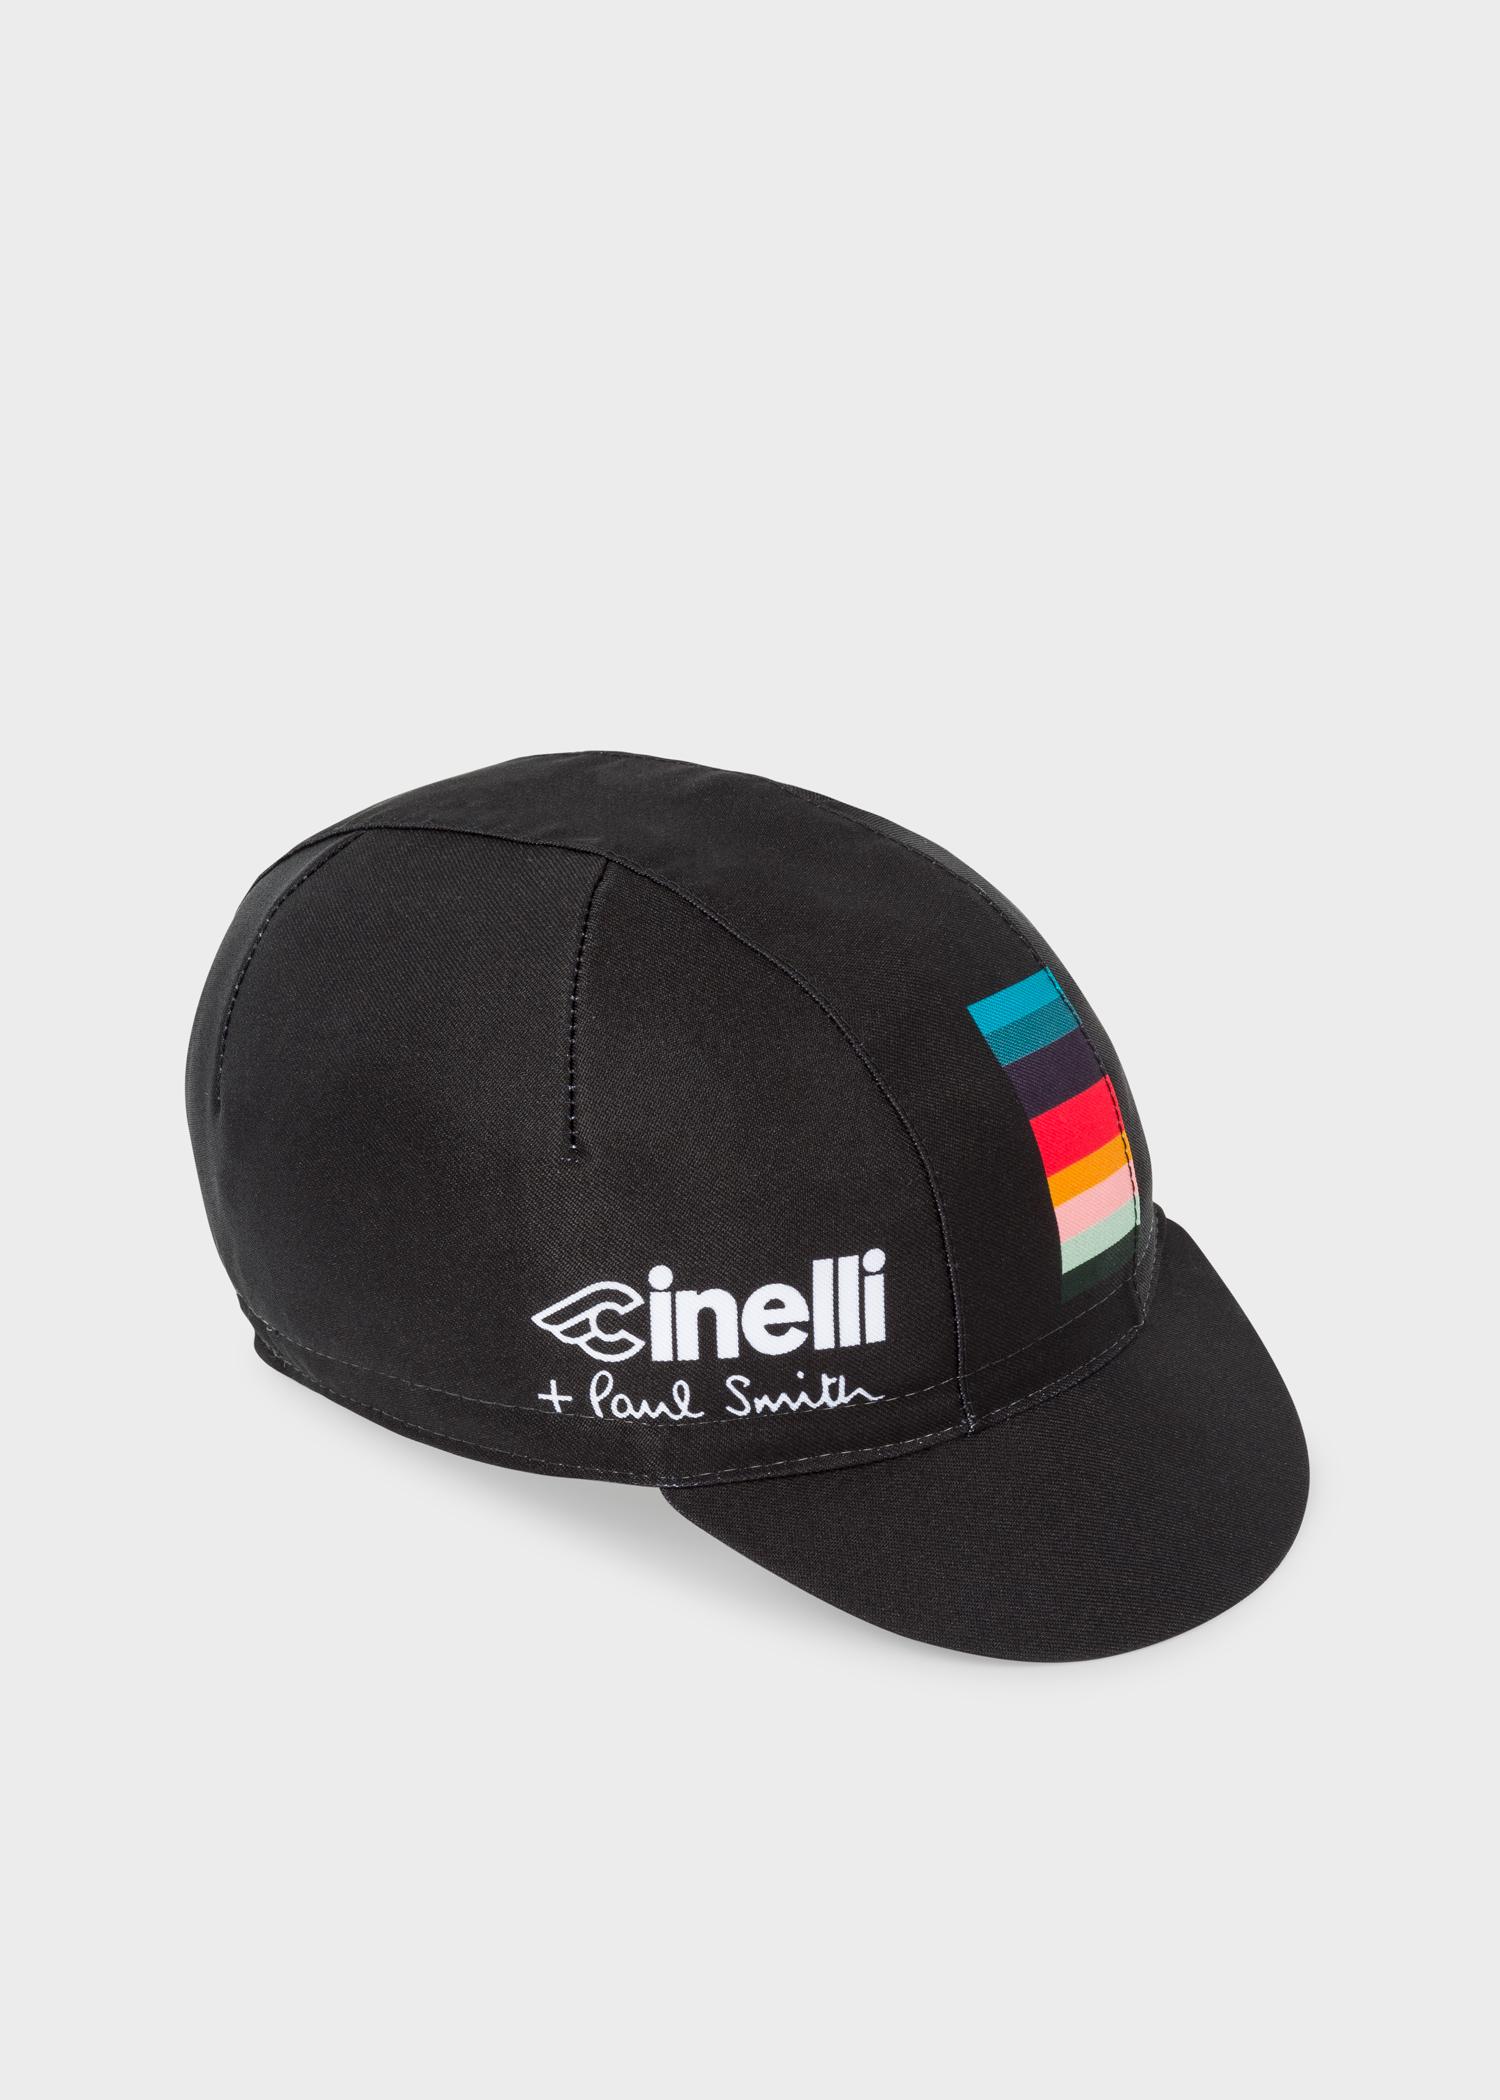 Paul Smith + Cinelli Black  Artist Stripe  Detail Cycling Cap - Paul ... 98466bffe87